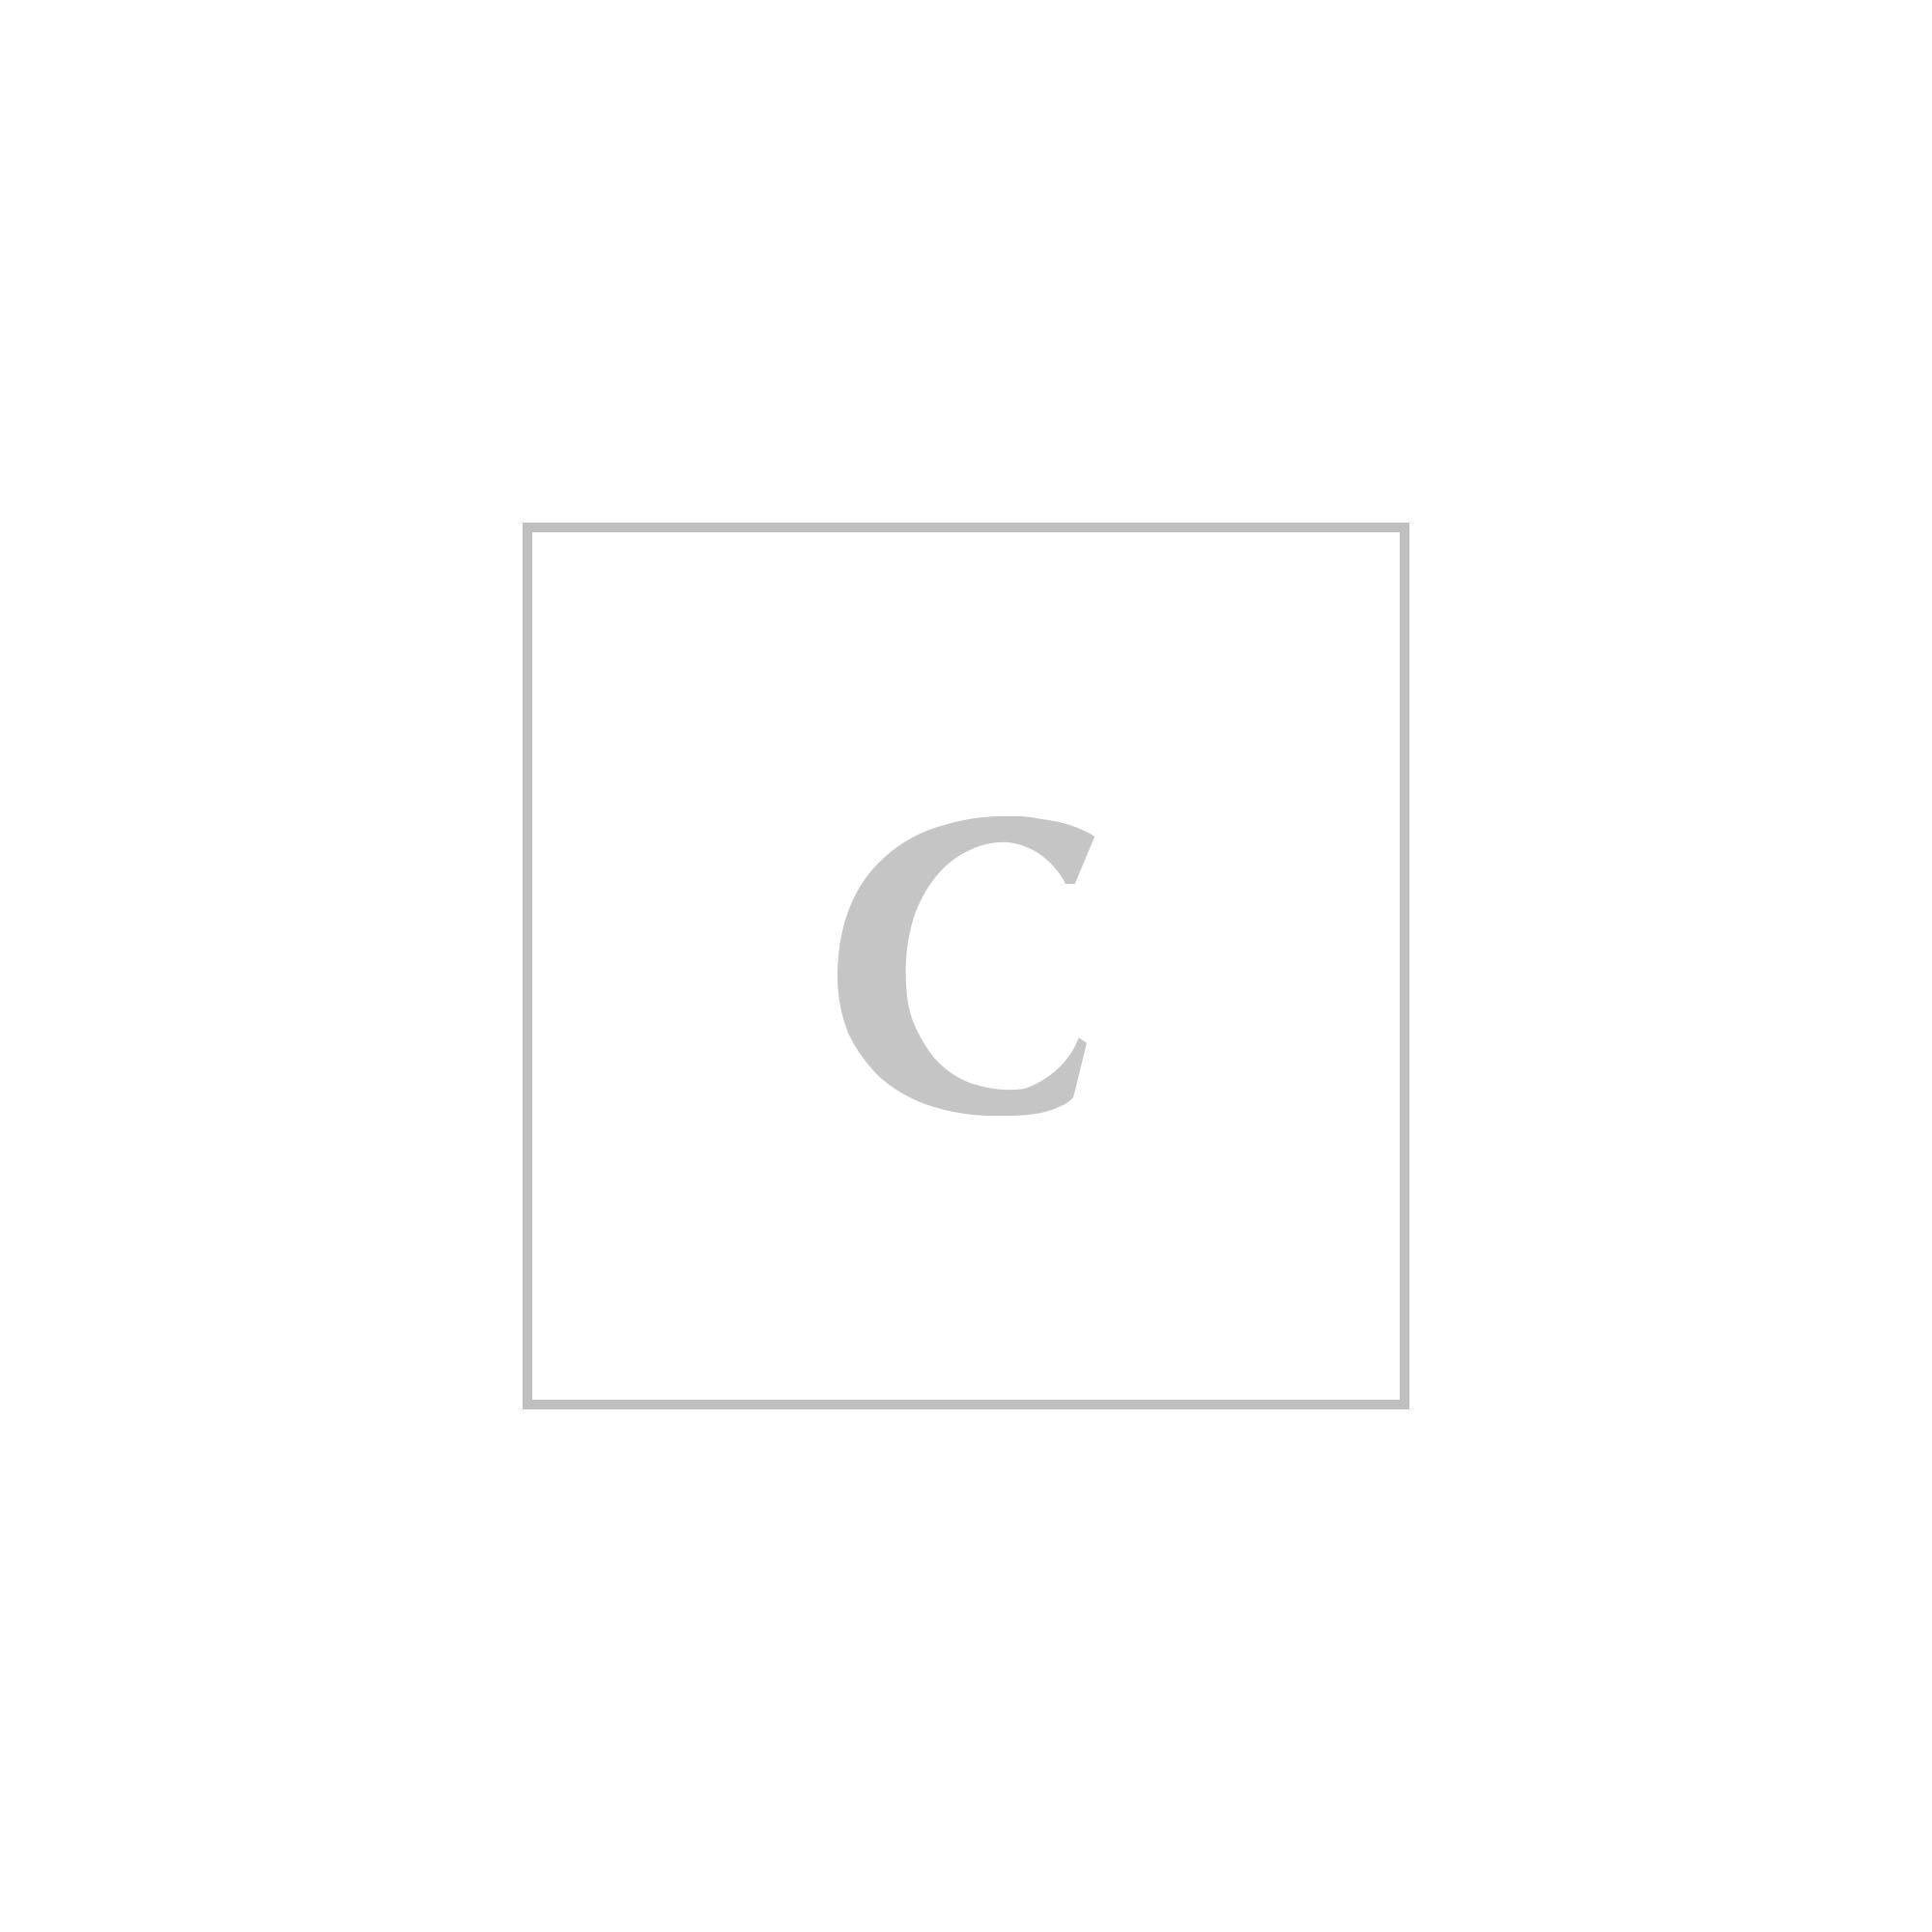 ... Stella mccartney 3 chain falabella tote bag c4f8793a57cbb